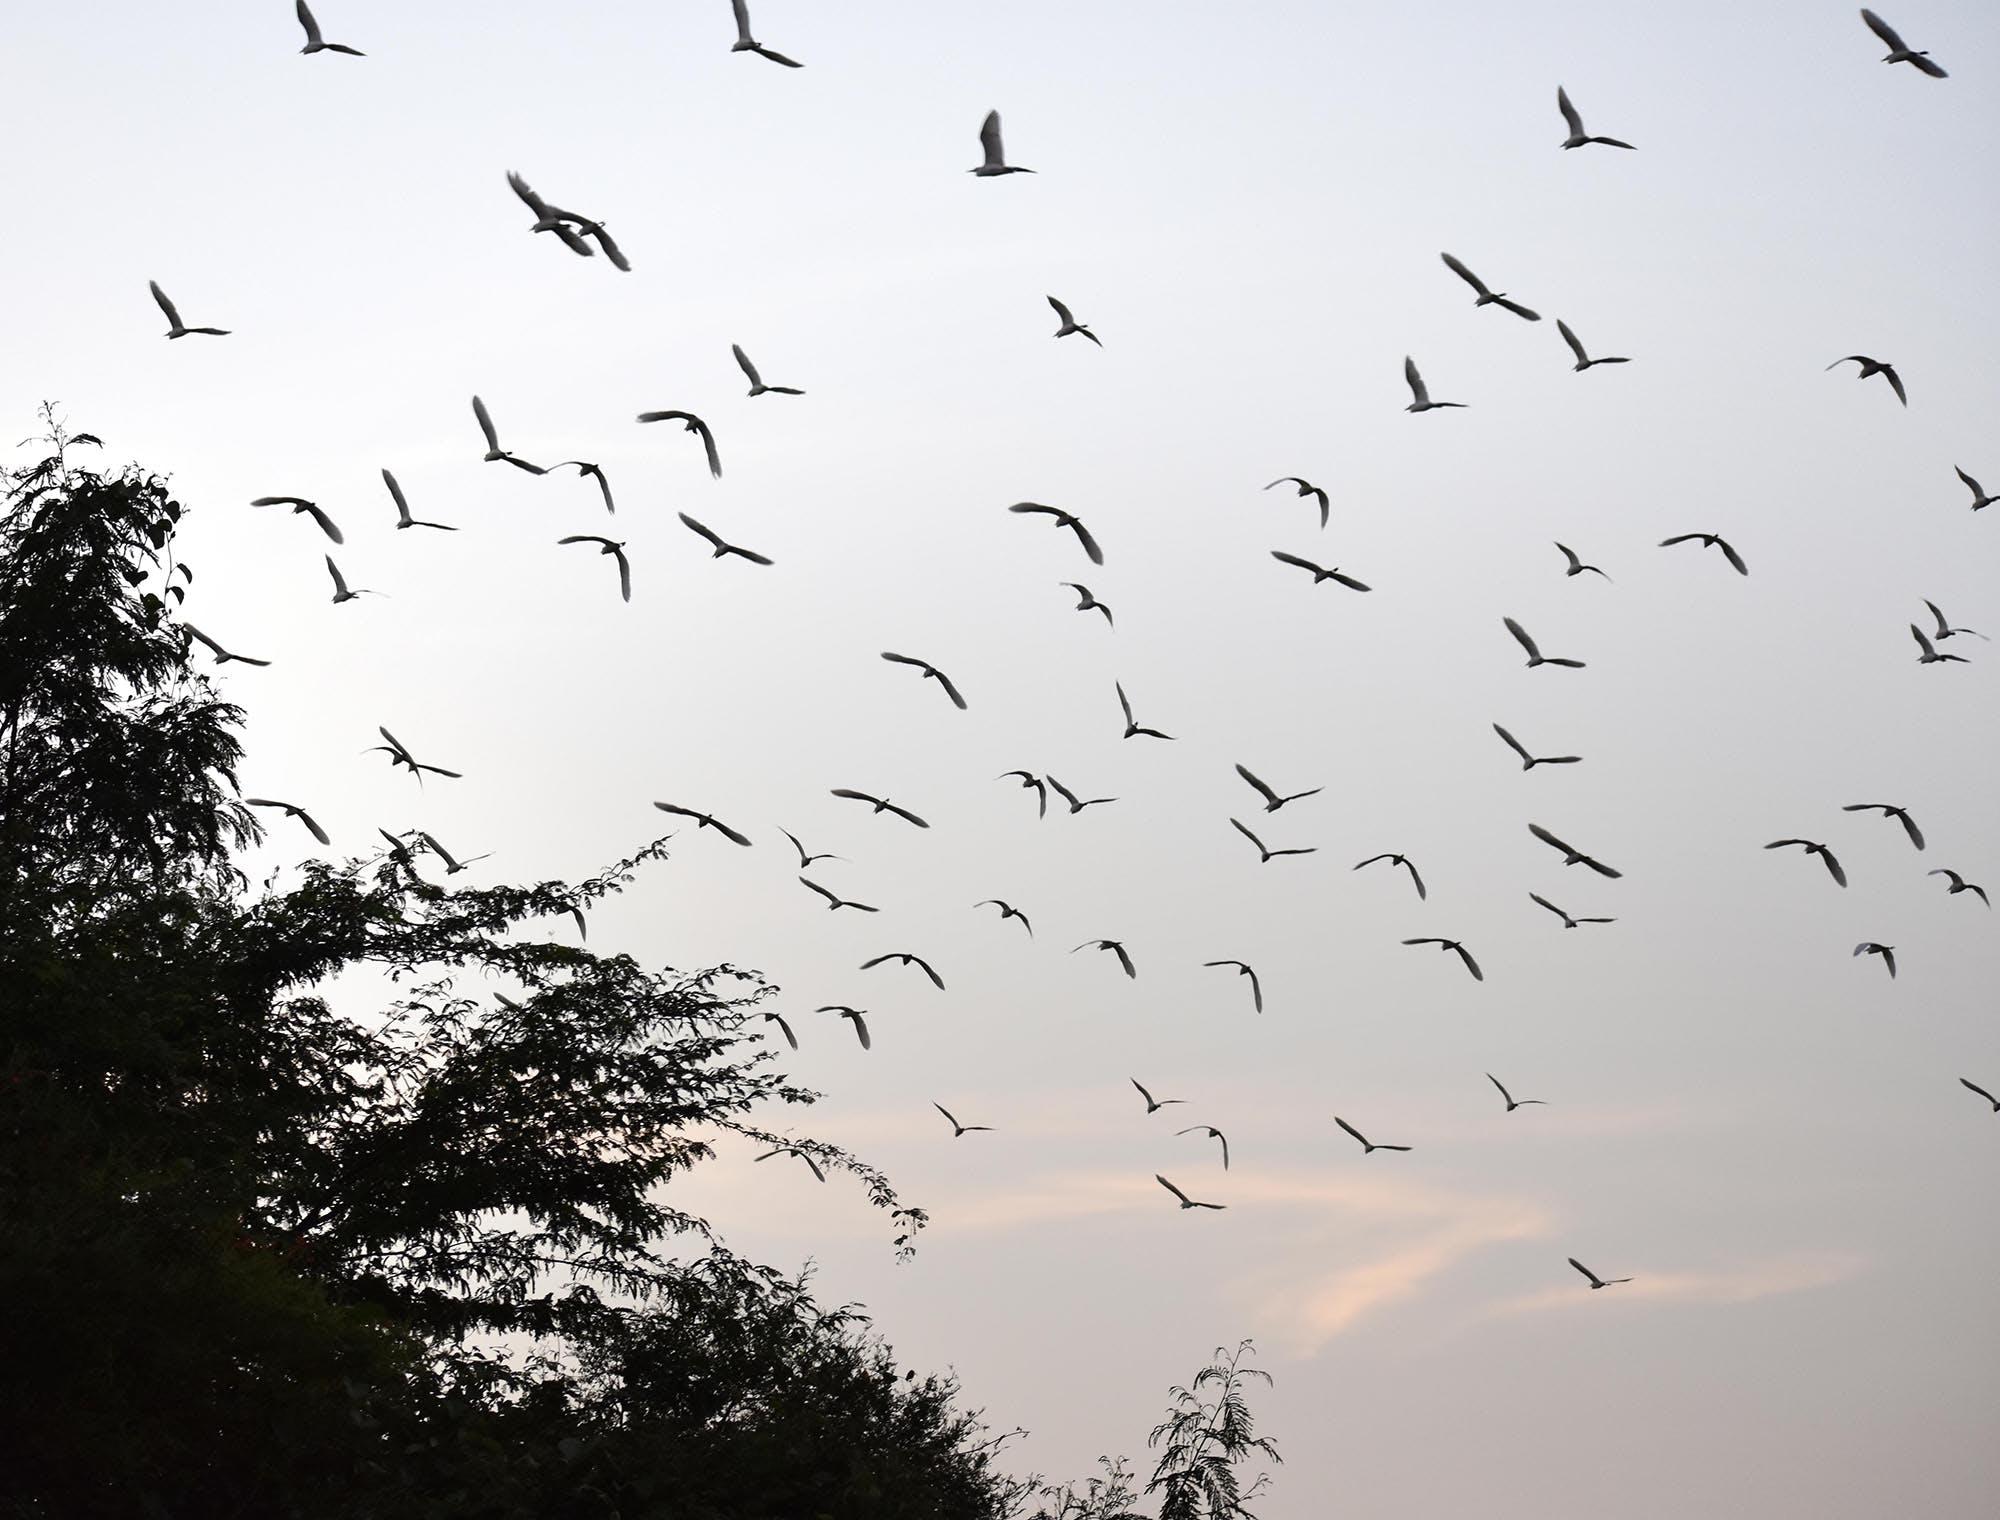 Kostenloses Stock Foto zu paradiesvögel